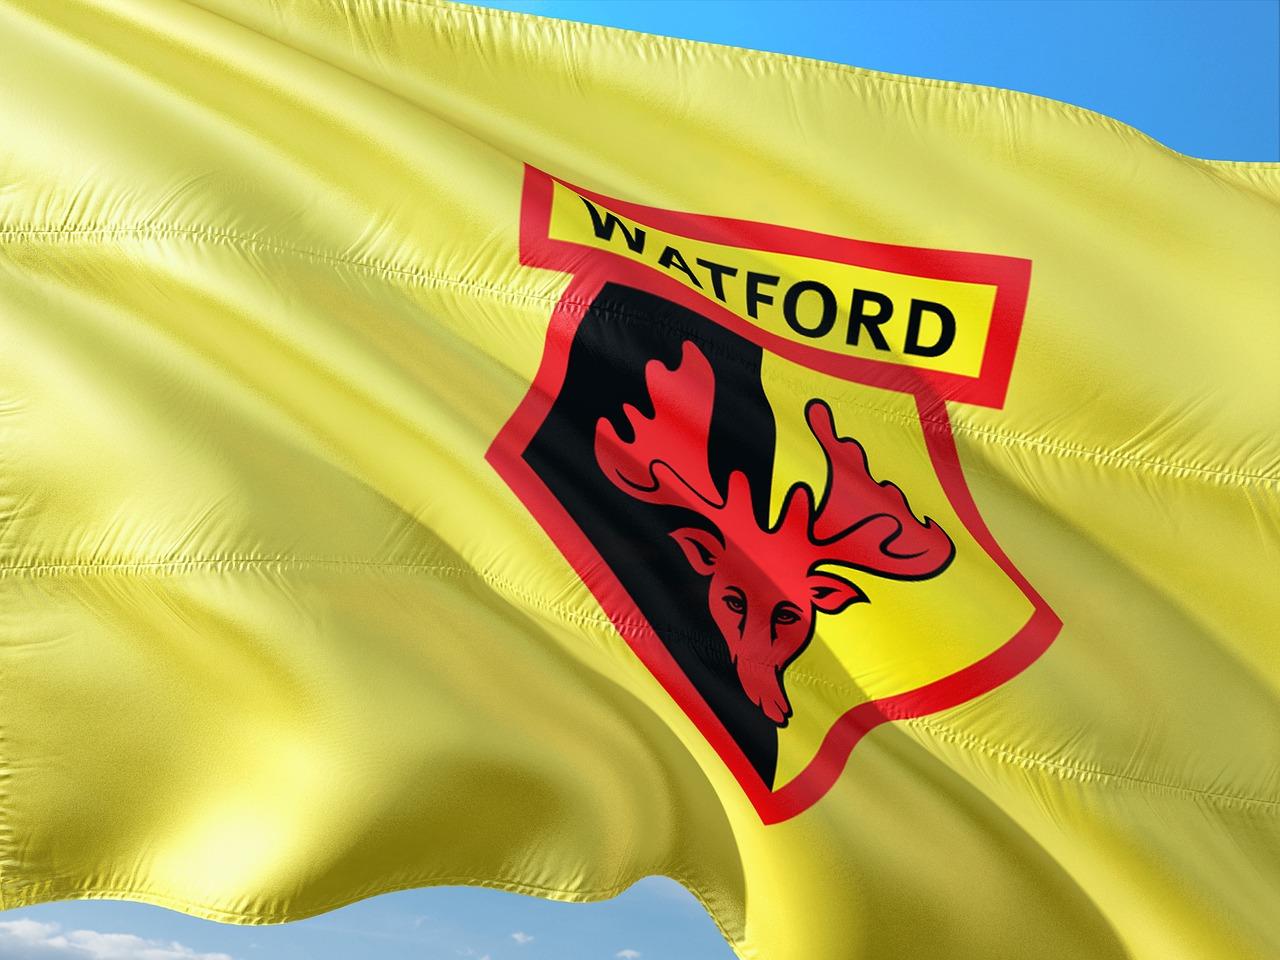 Watford_flag